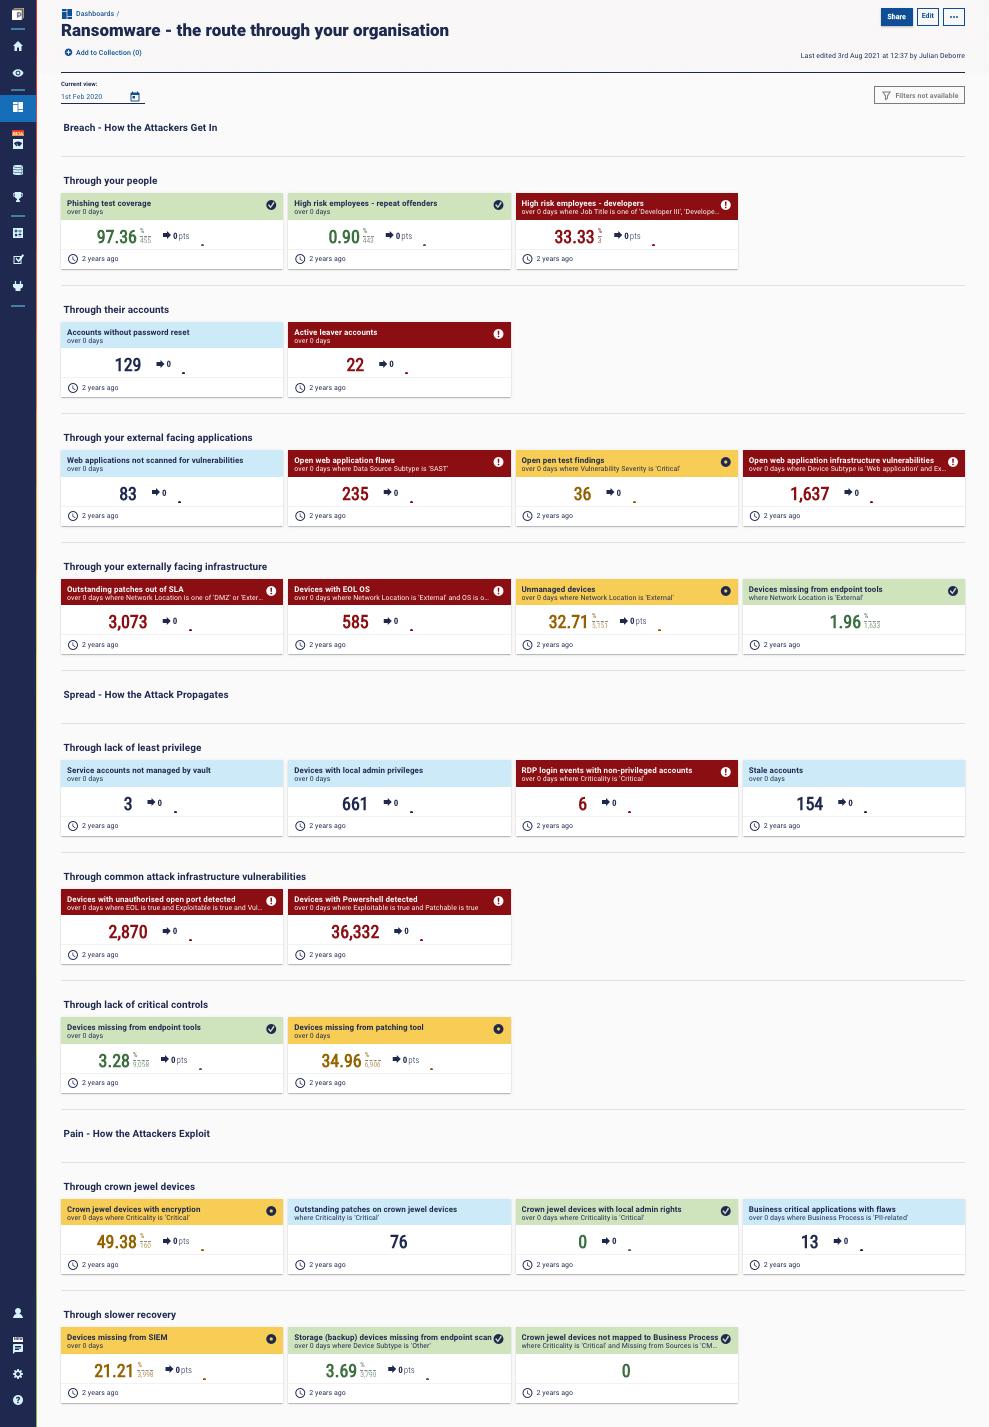 Full ransomware protection metrics dashboard